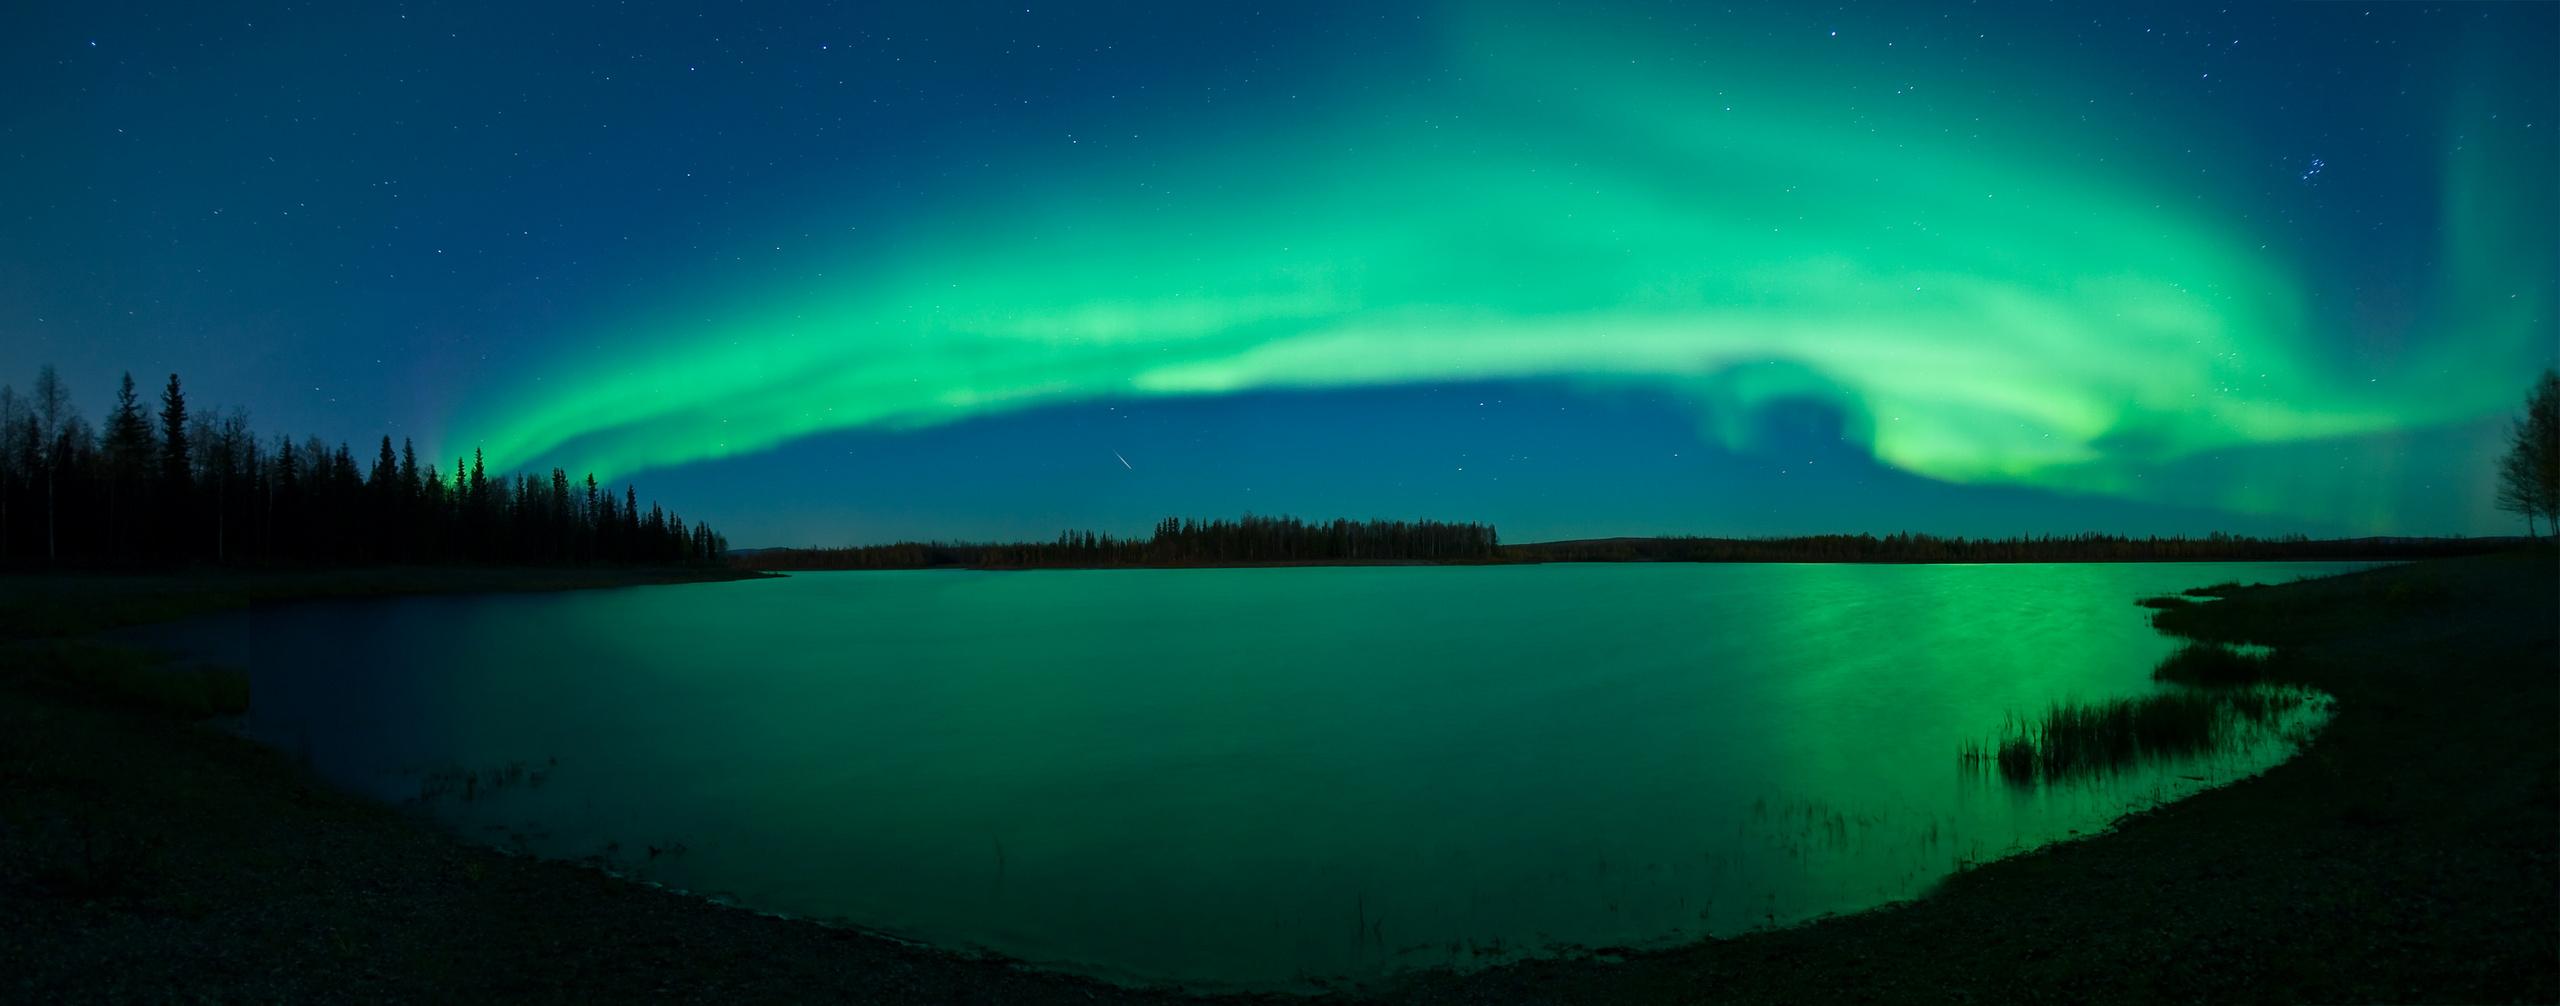 goodshoutmedia-northern-lights.jpg